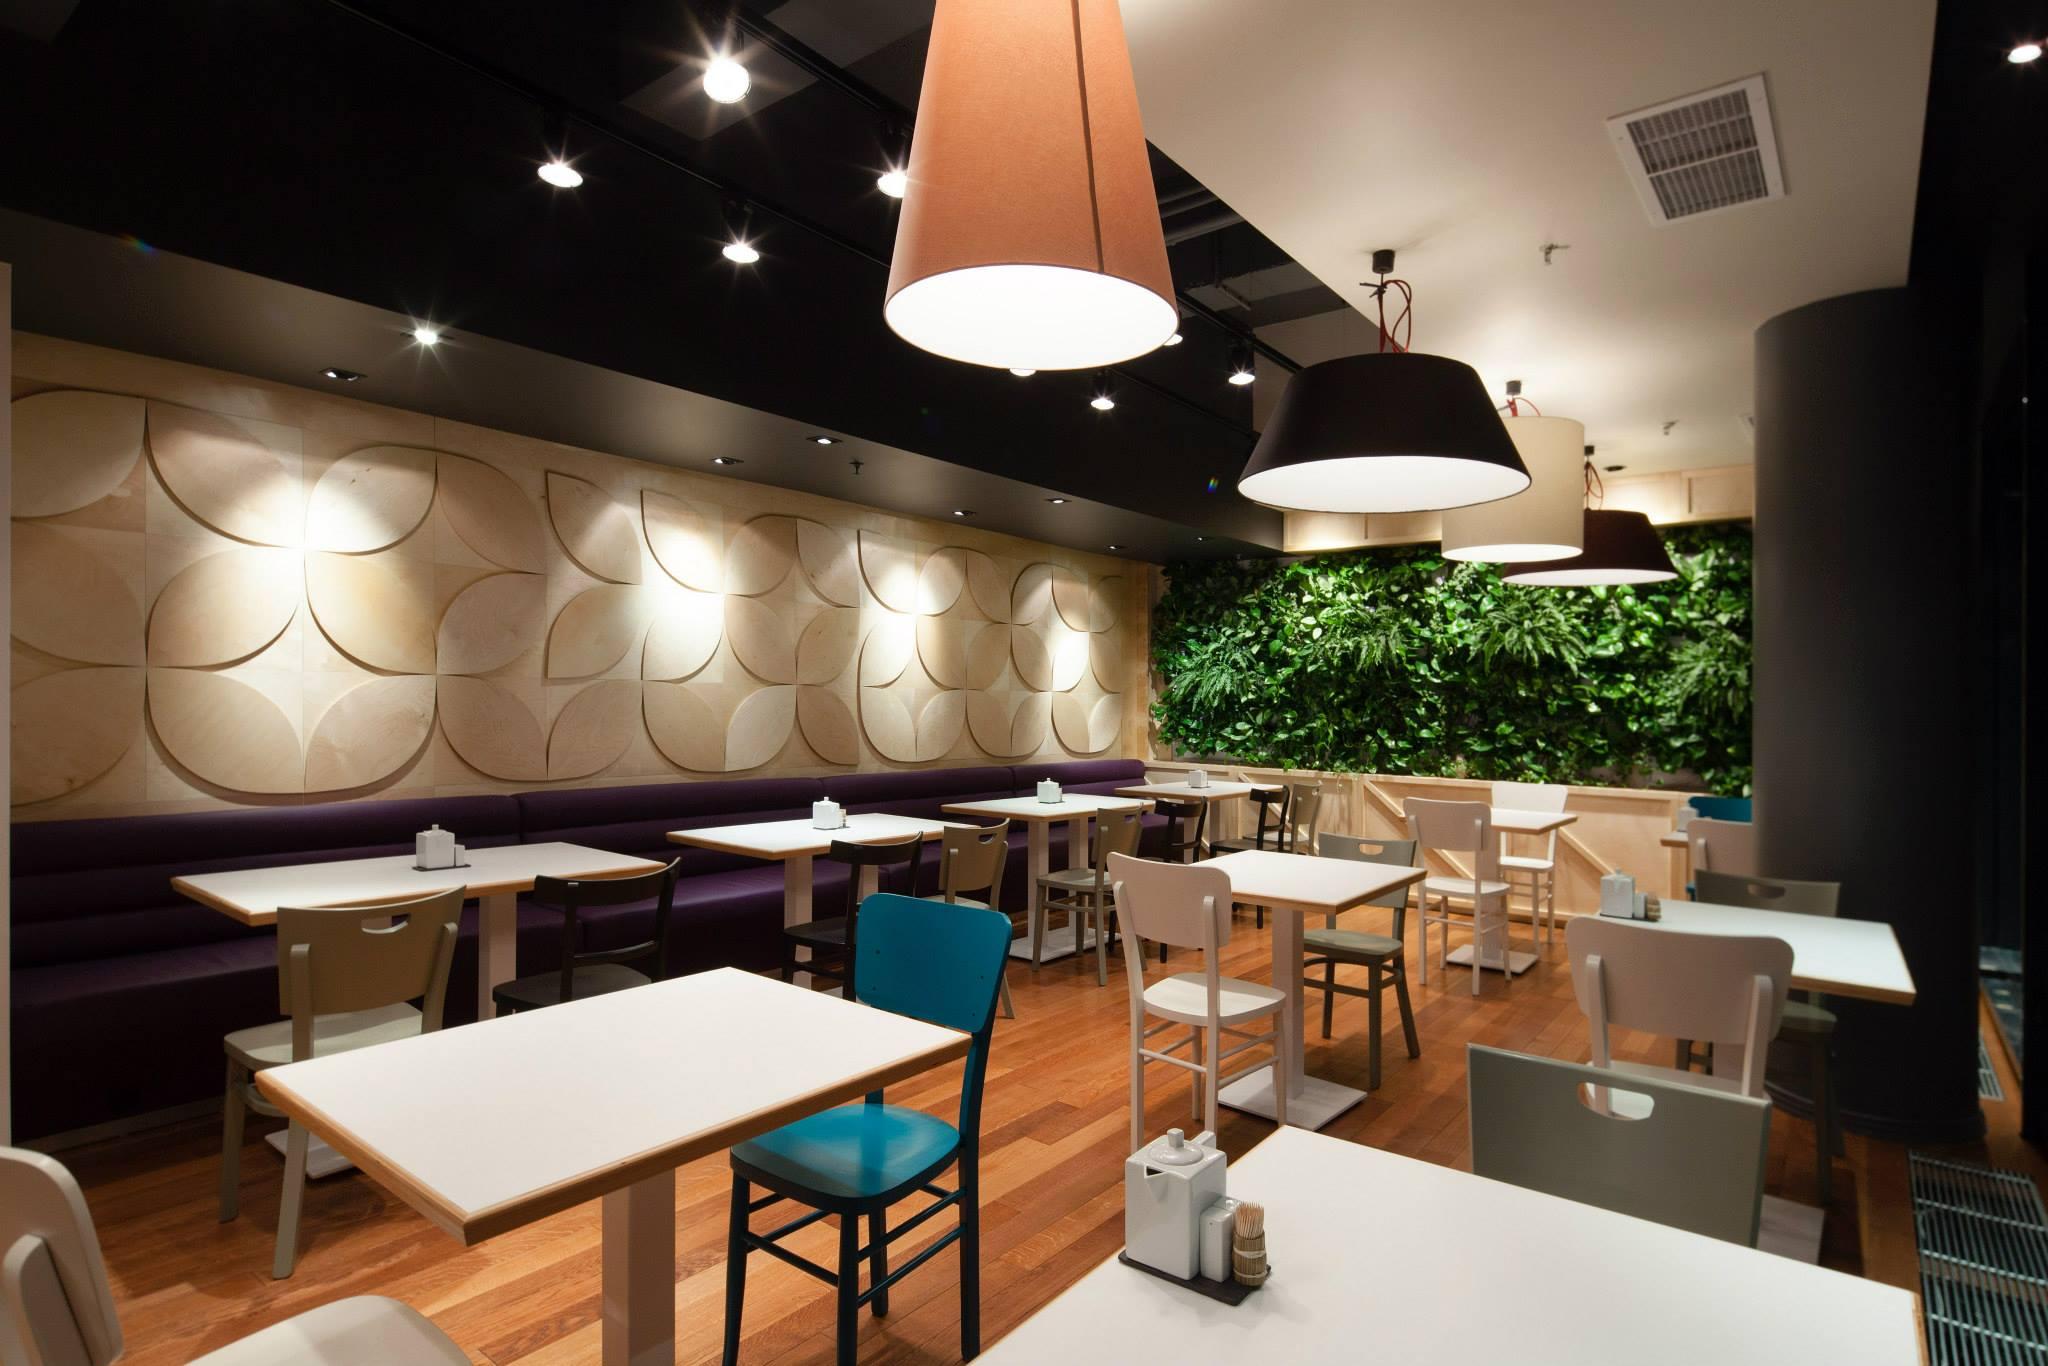 YOSHI-Sushi-Teppanyaki-Trivenus-Ama-Design-12